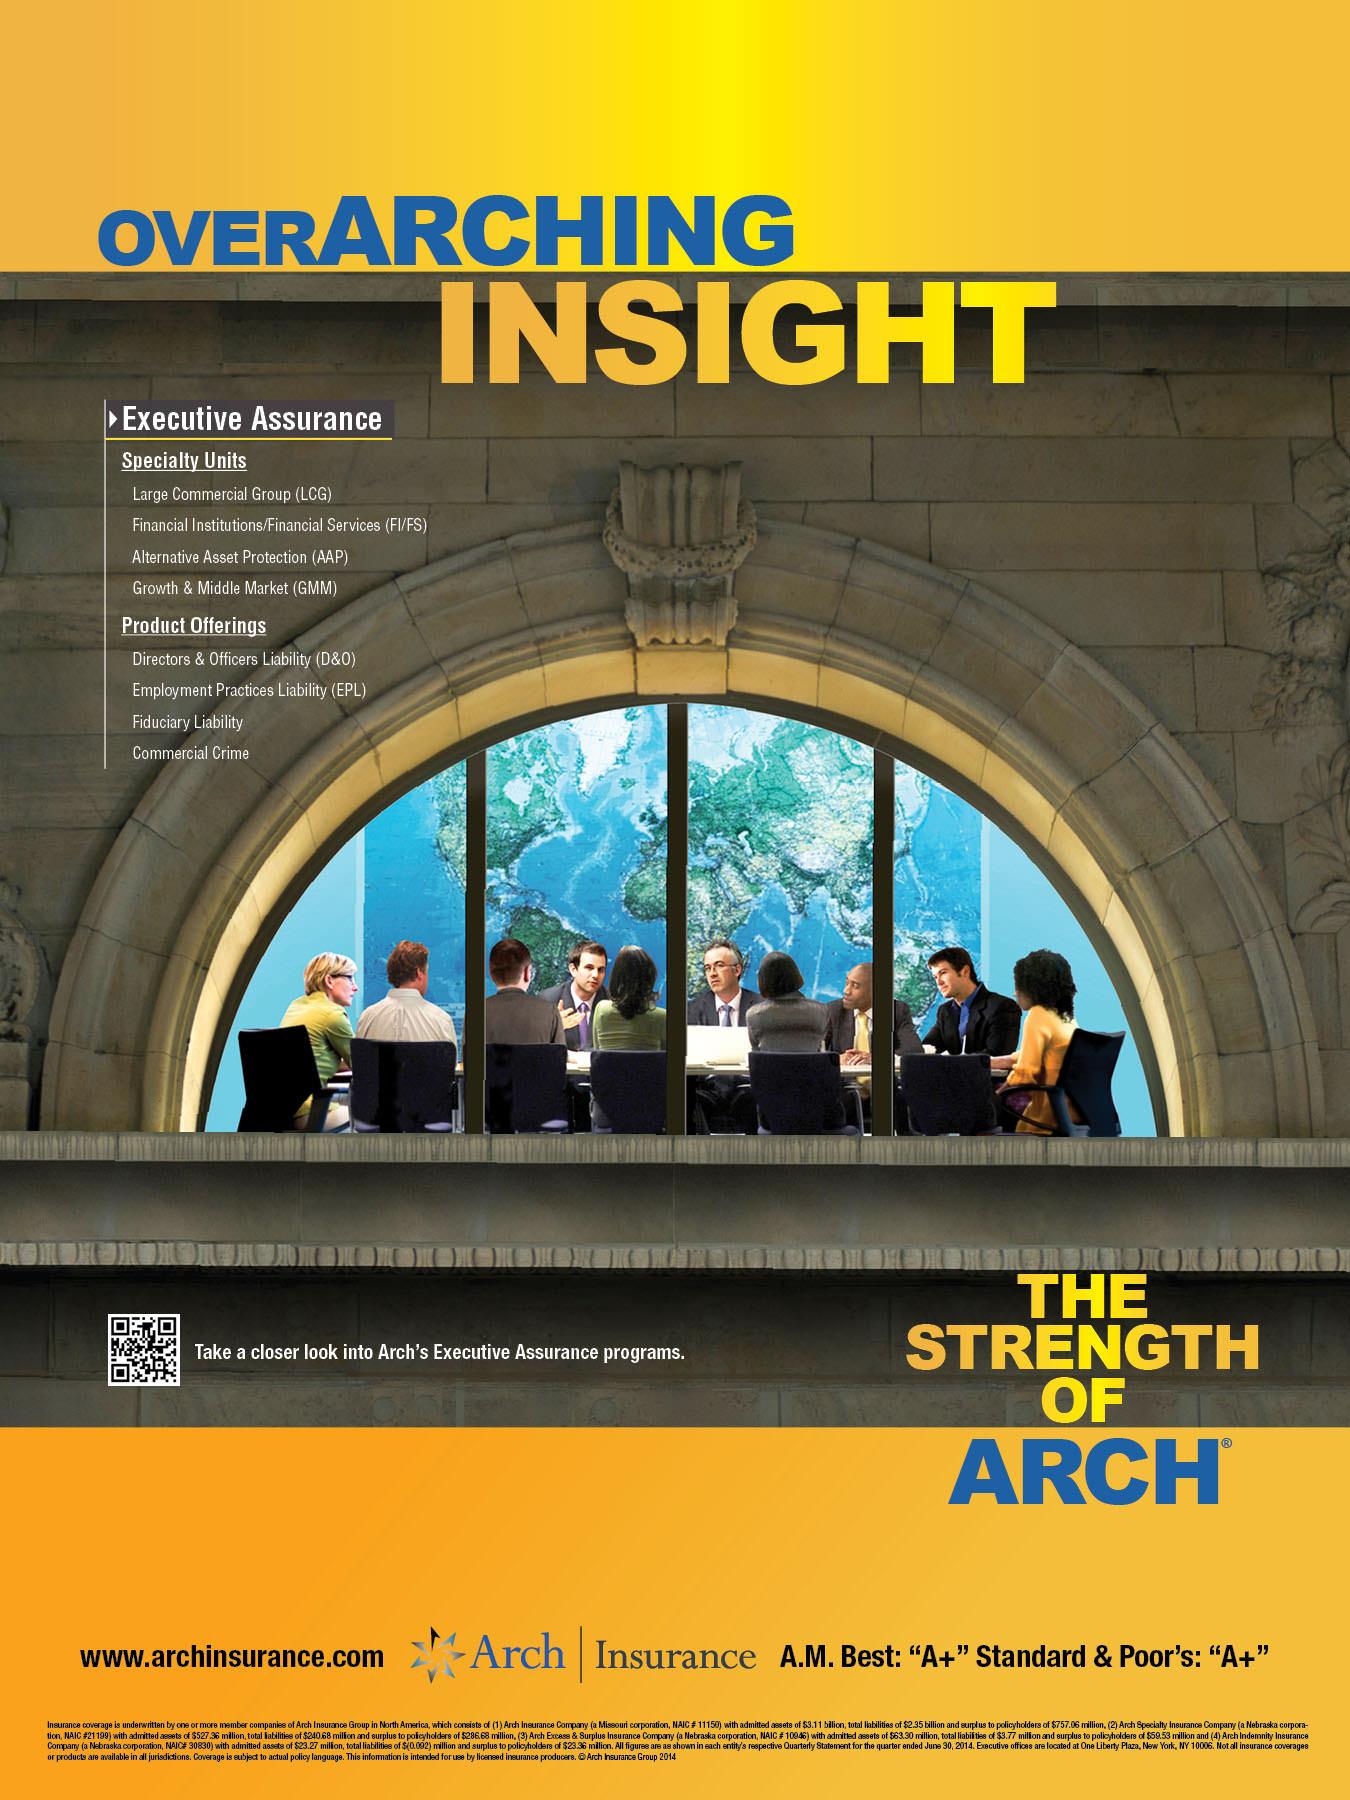 Arch Insurance PRINT-4-Executive Assurance 18x24Poster